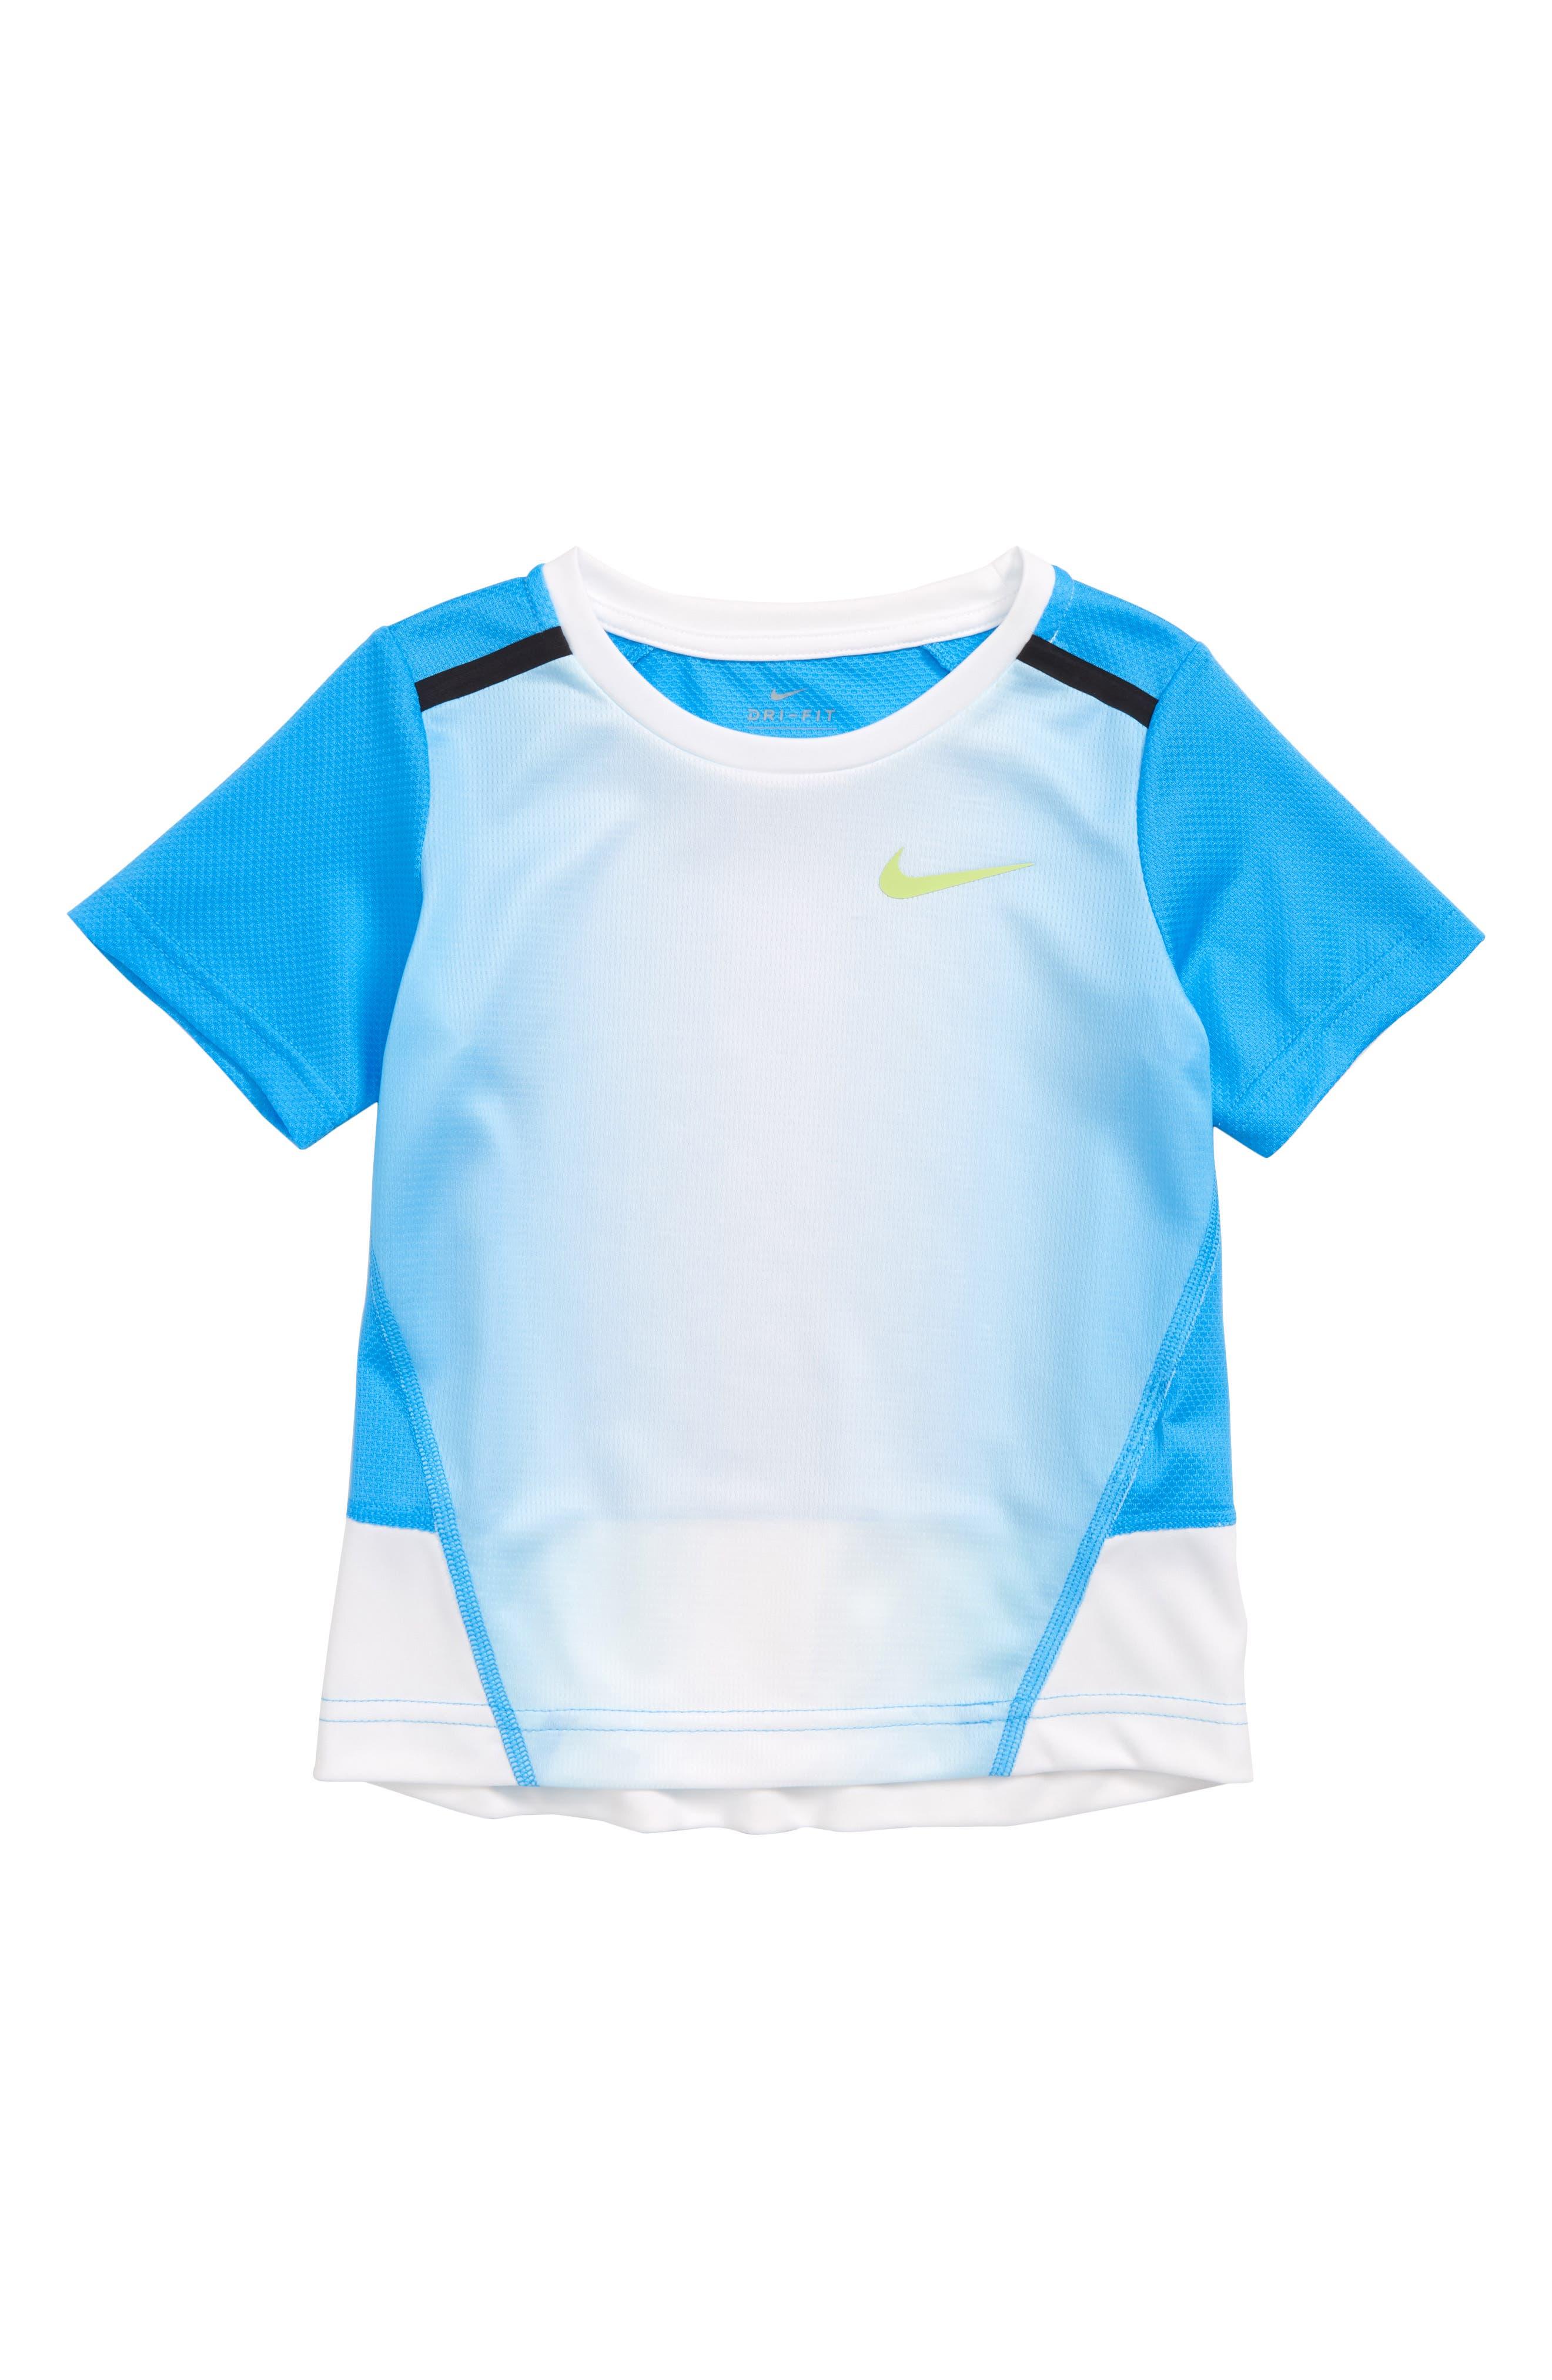 Dry INSTACOOL Shirt,                             Alternate thumbnail 8, color,